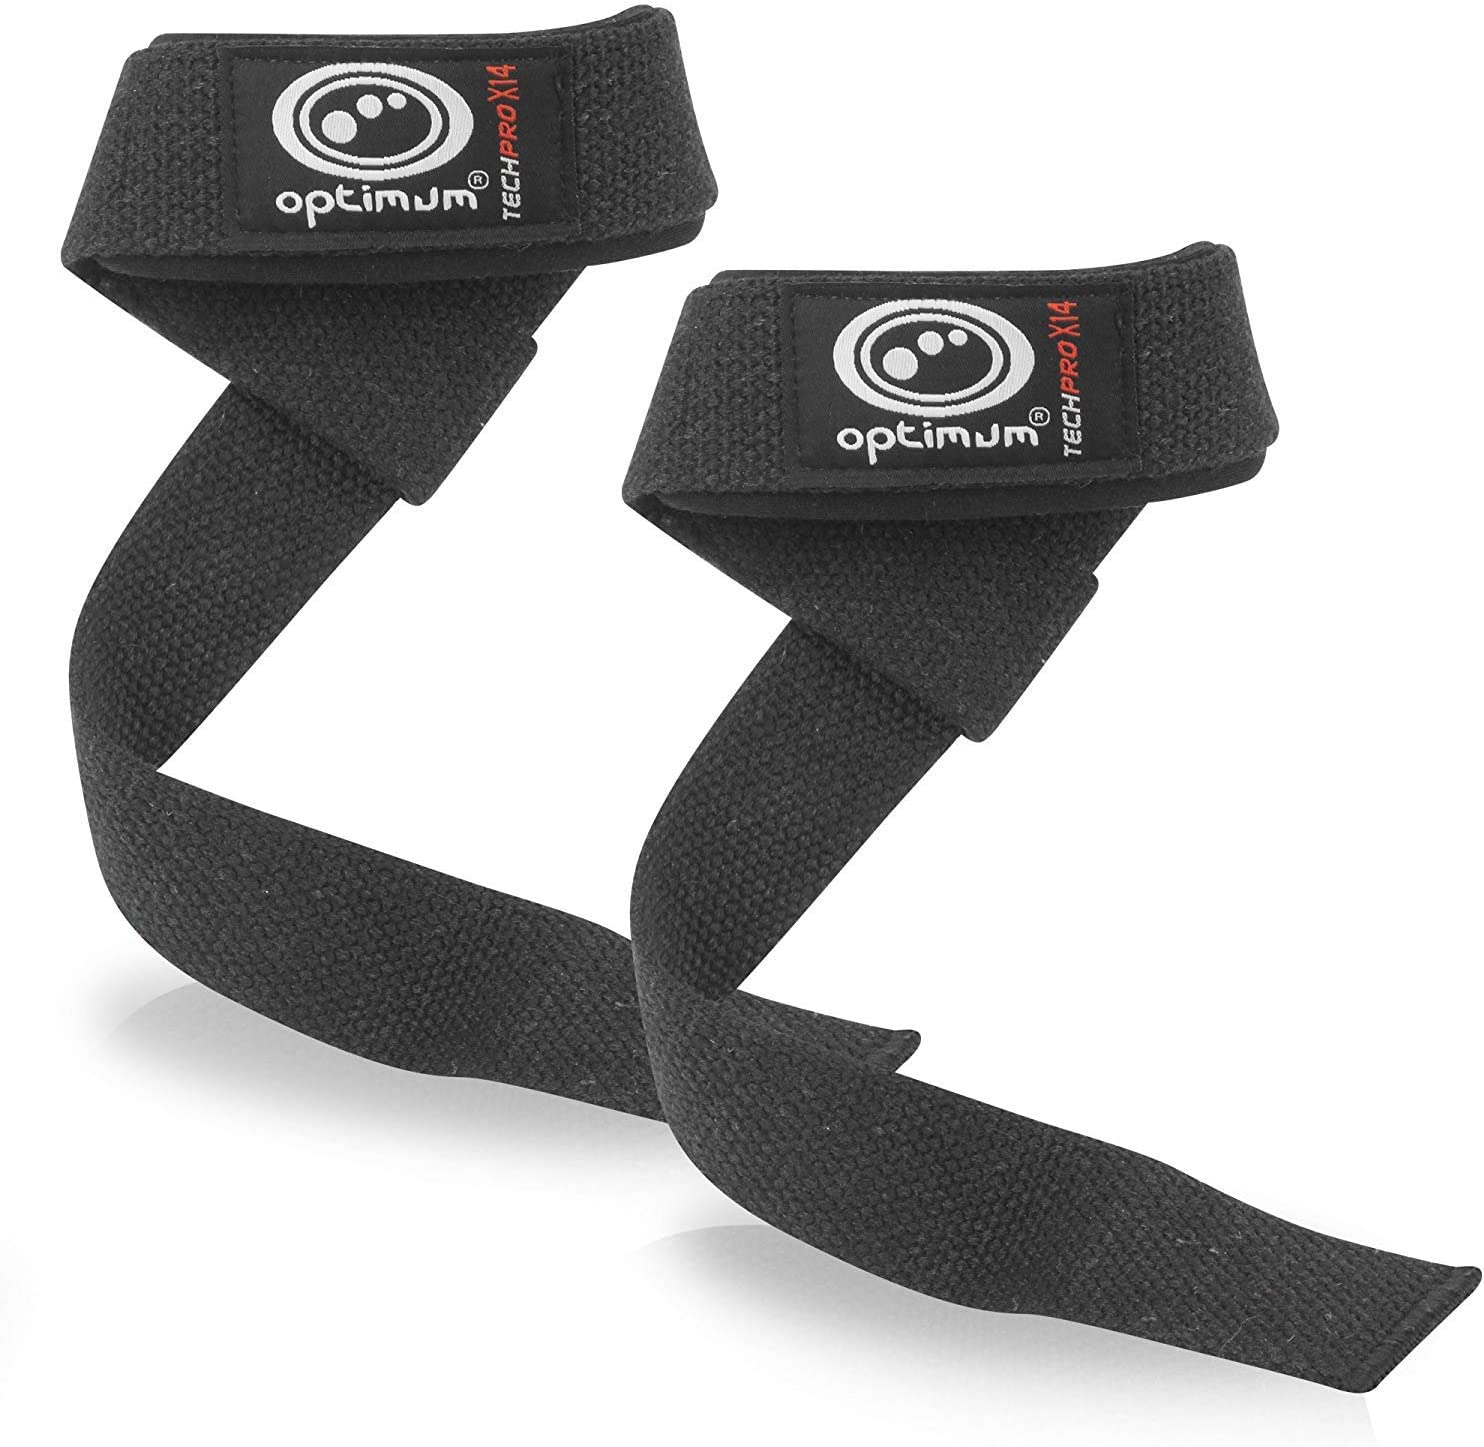 White//Black, Optimum Tech Pro X14 Knee Wraps